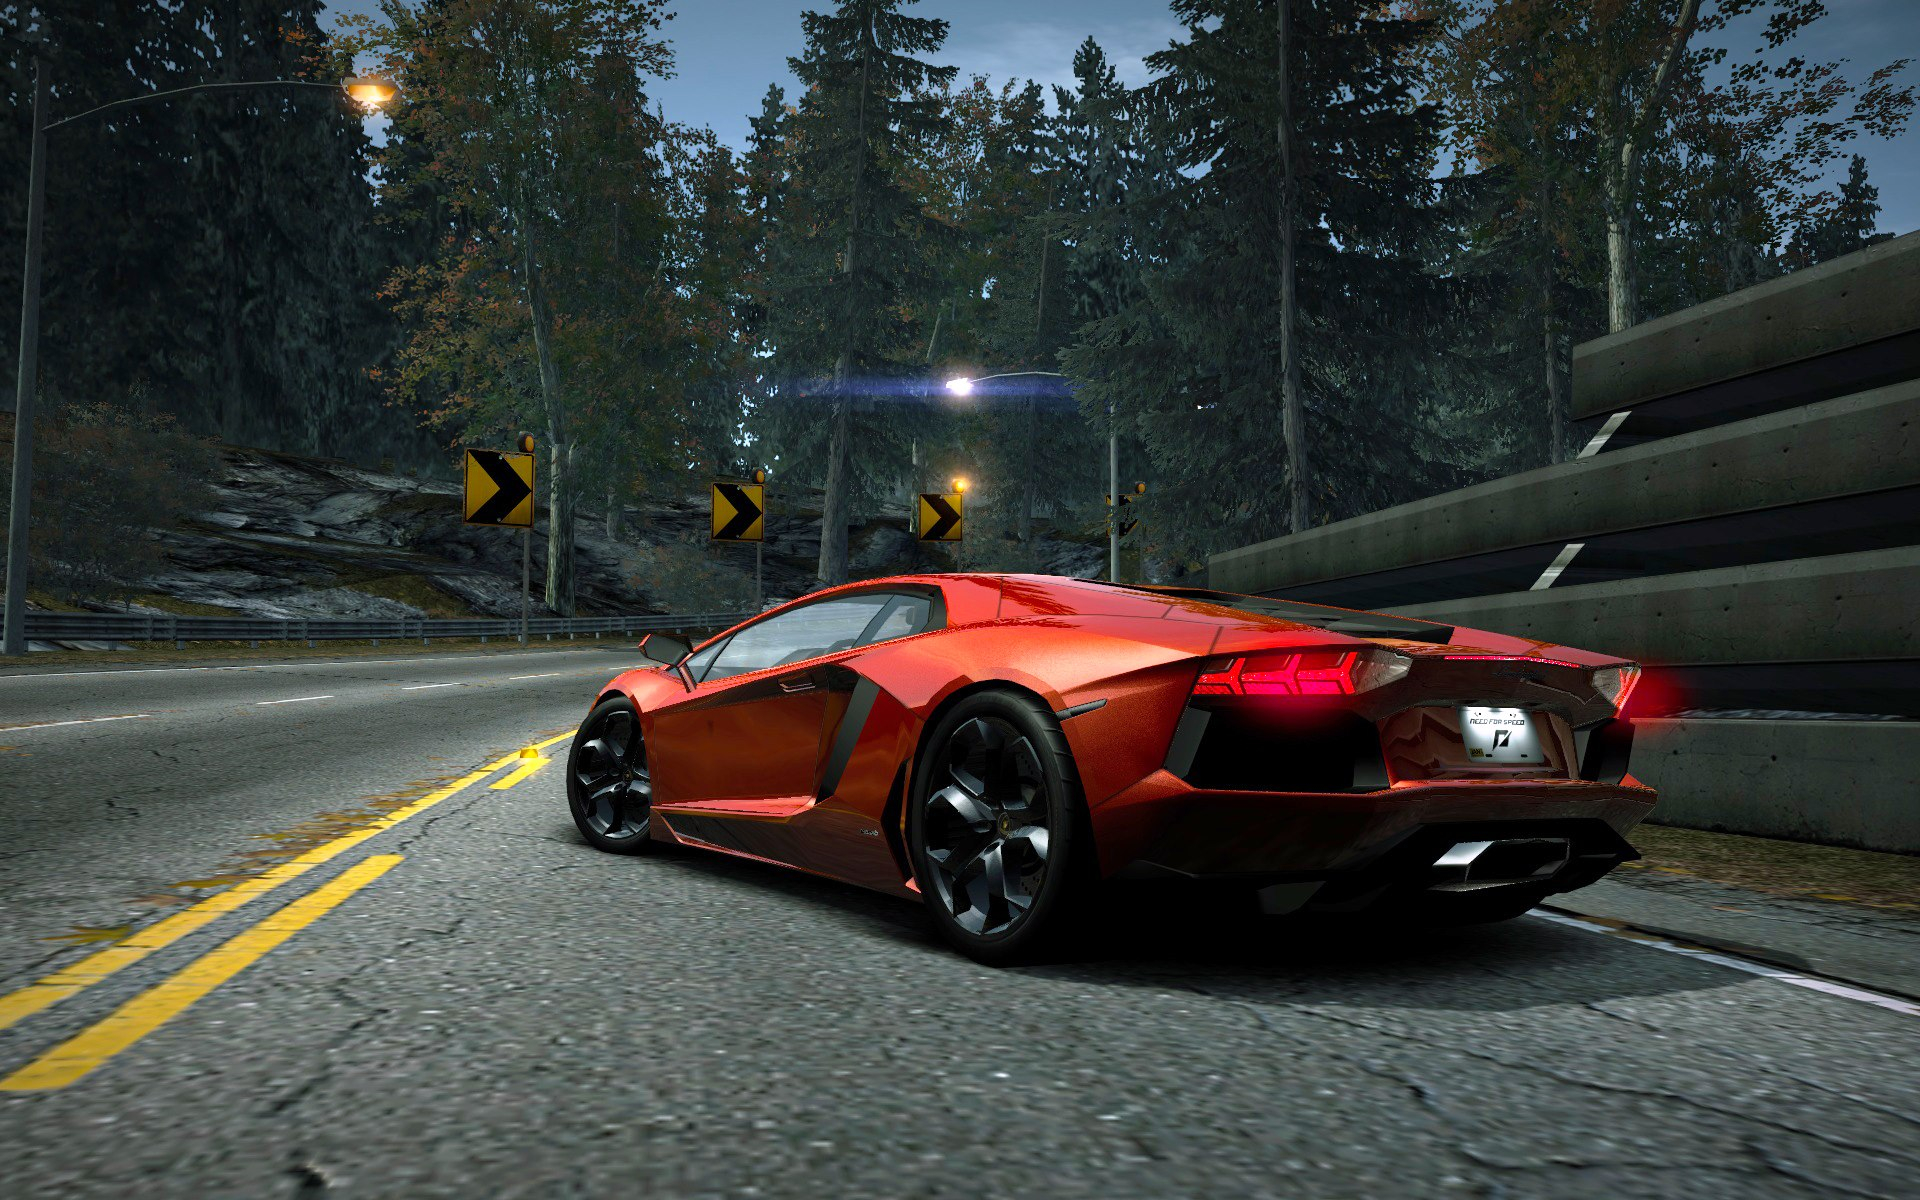 Lamborghini Aventador Lp 700 4 Nfs World Wiki Fandom